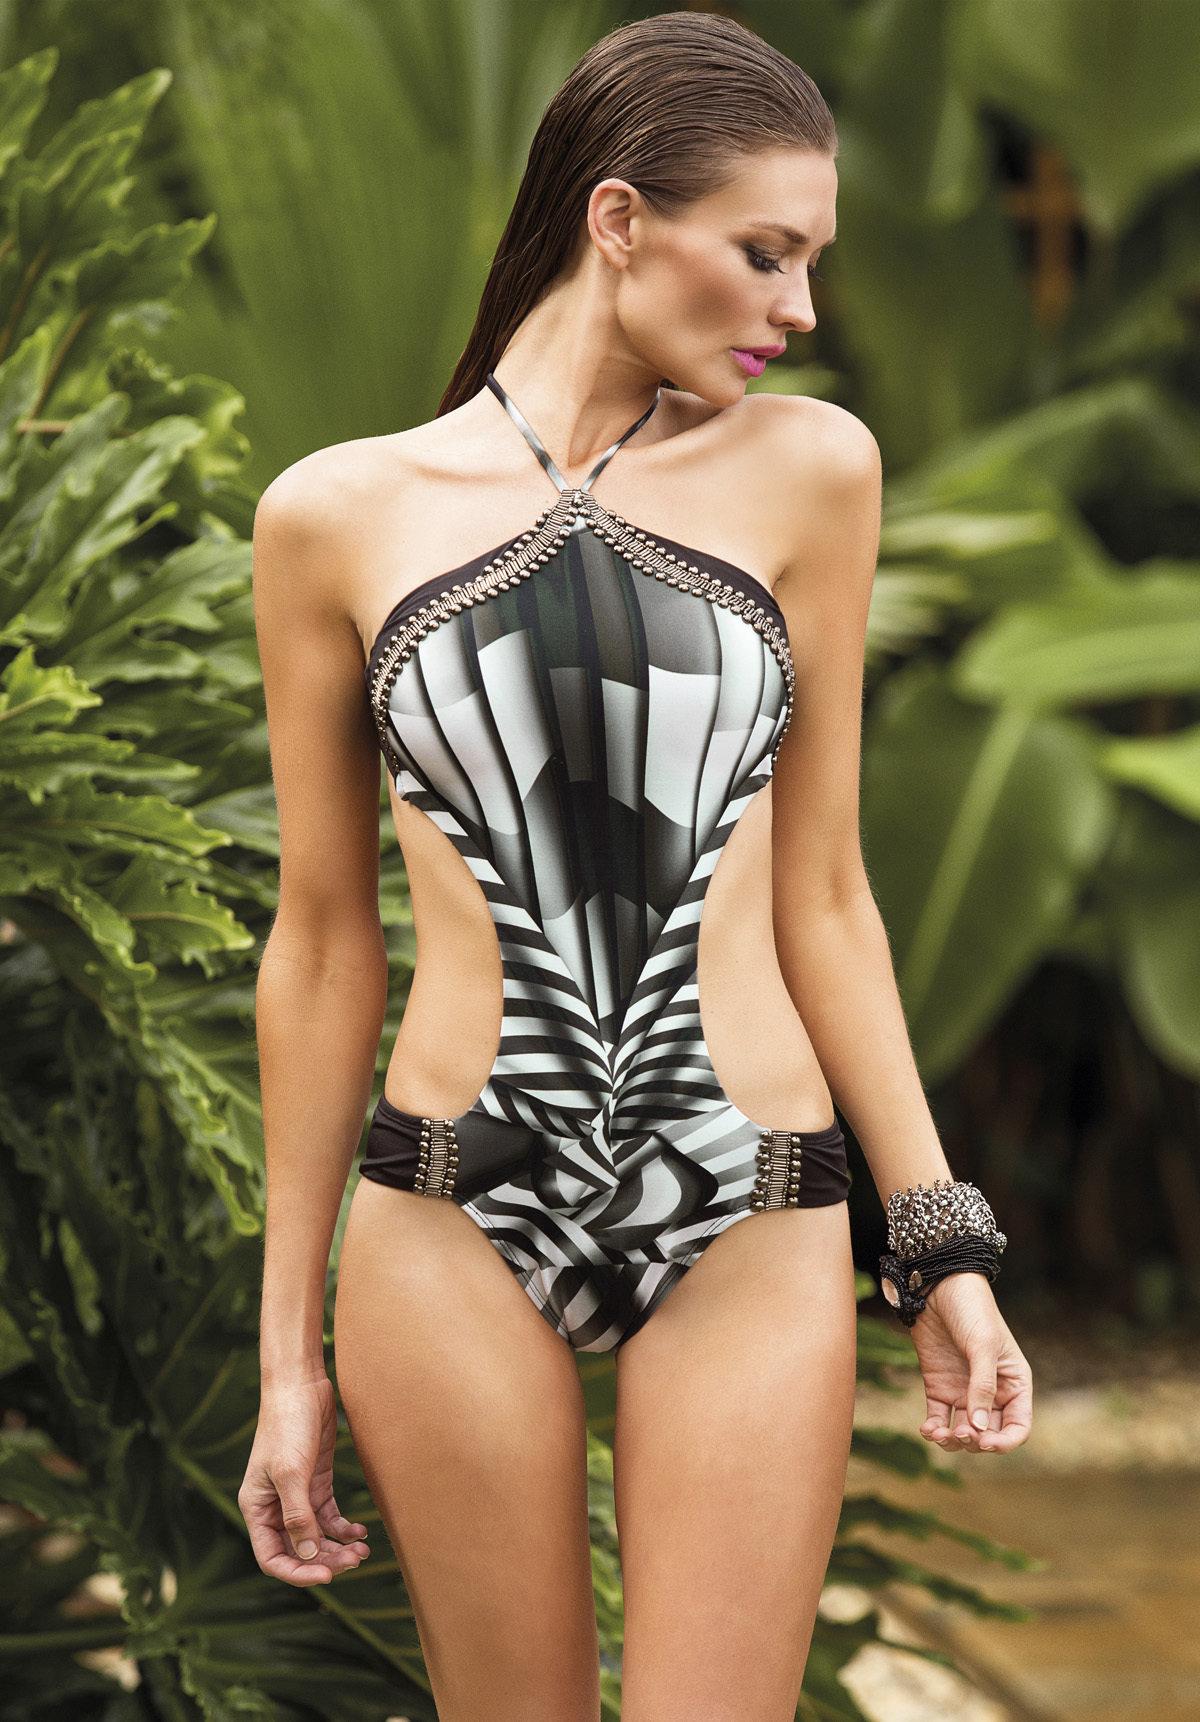 Paradizia Swimwear: Black Onyx Cutout One-Piece Swimsuit PARAD_SOHO